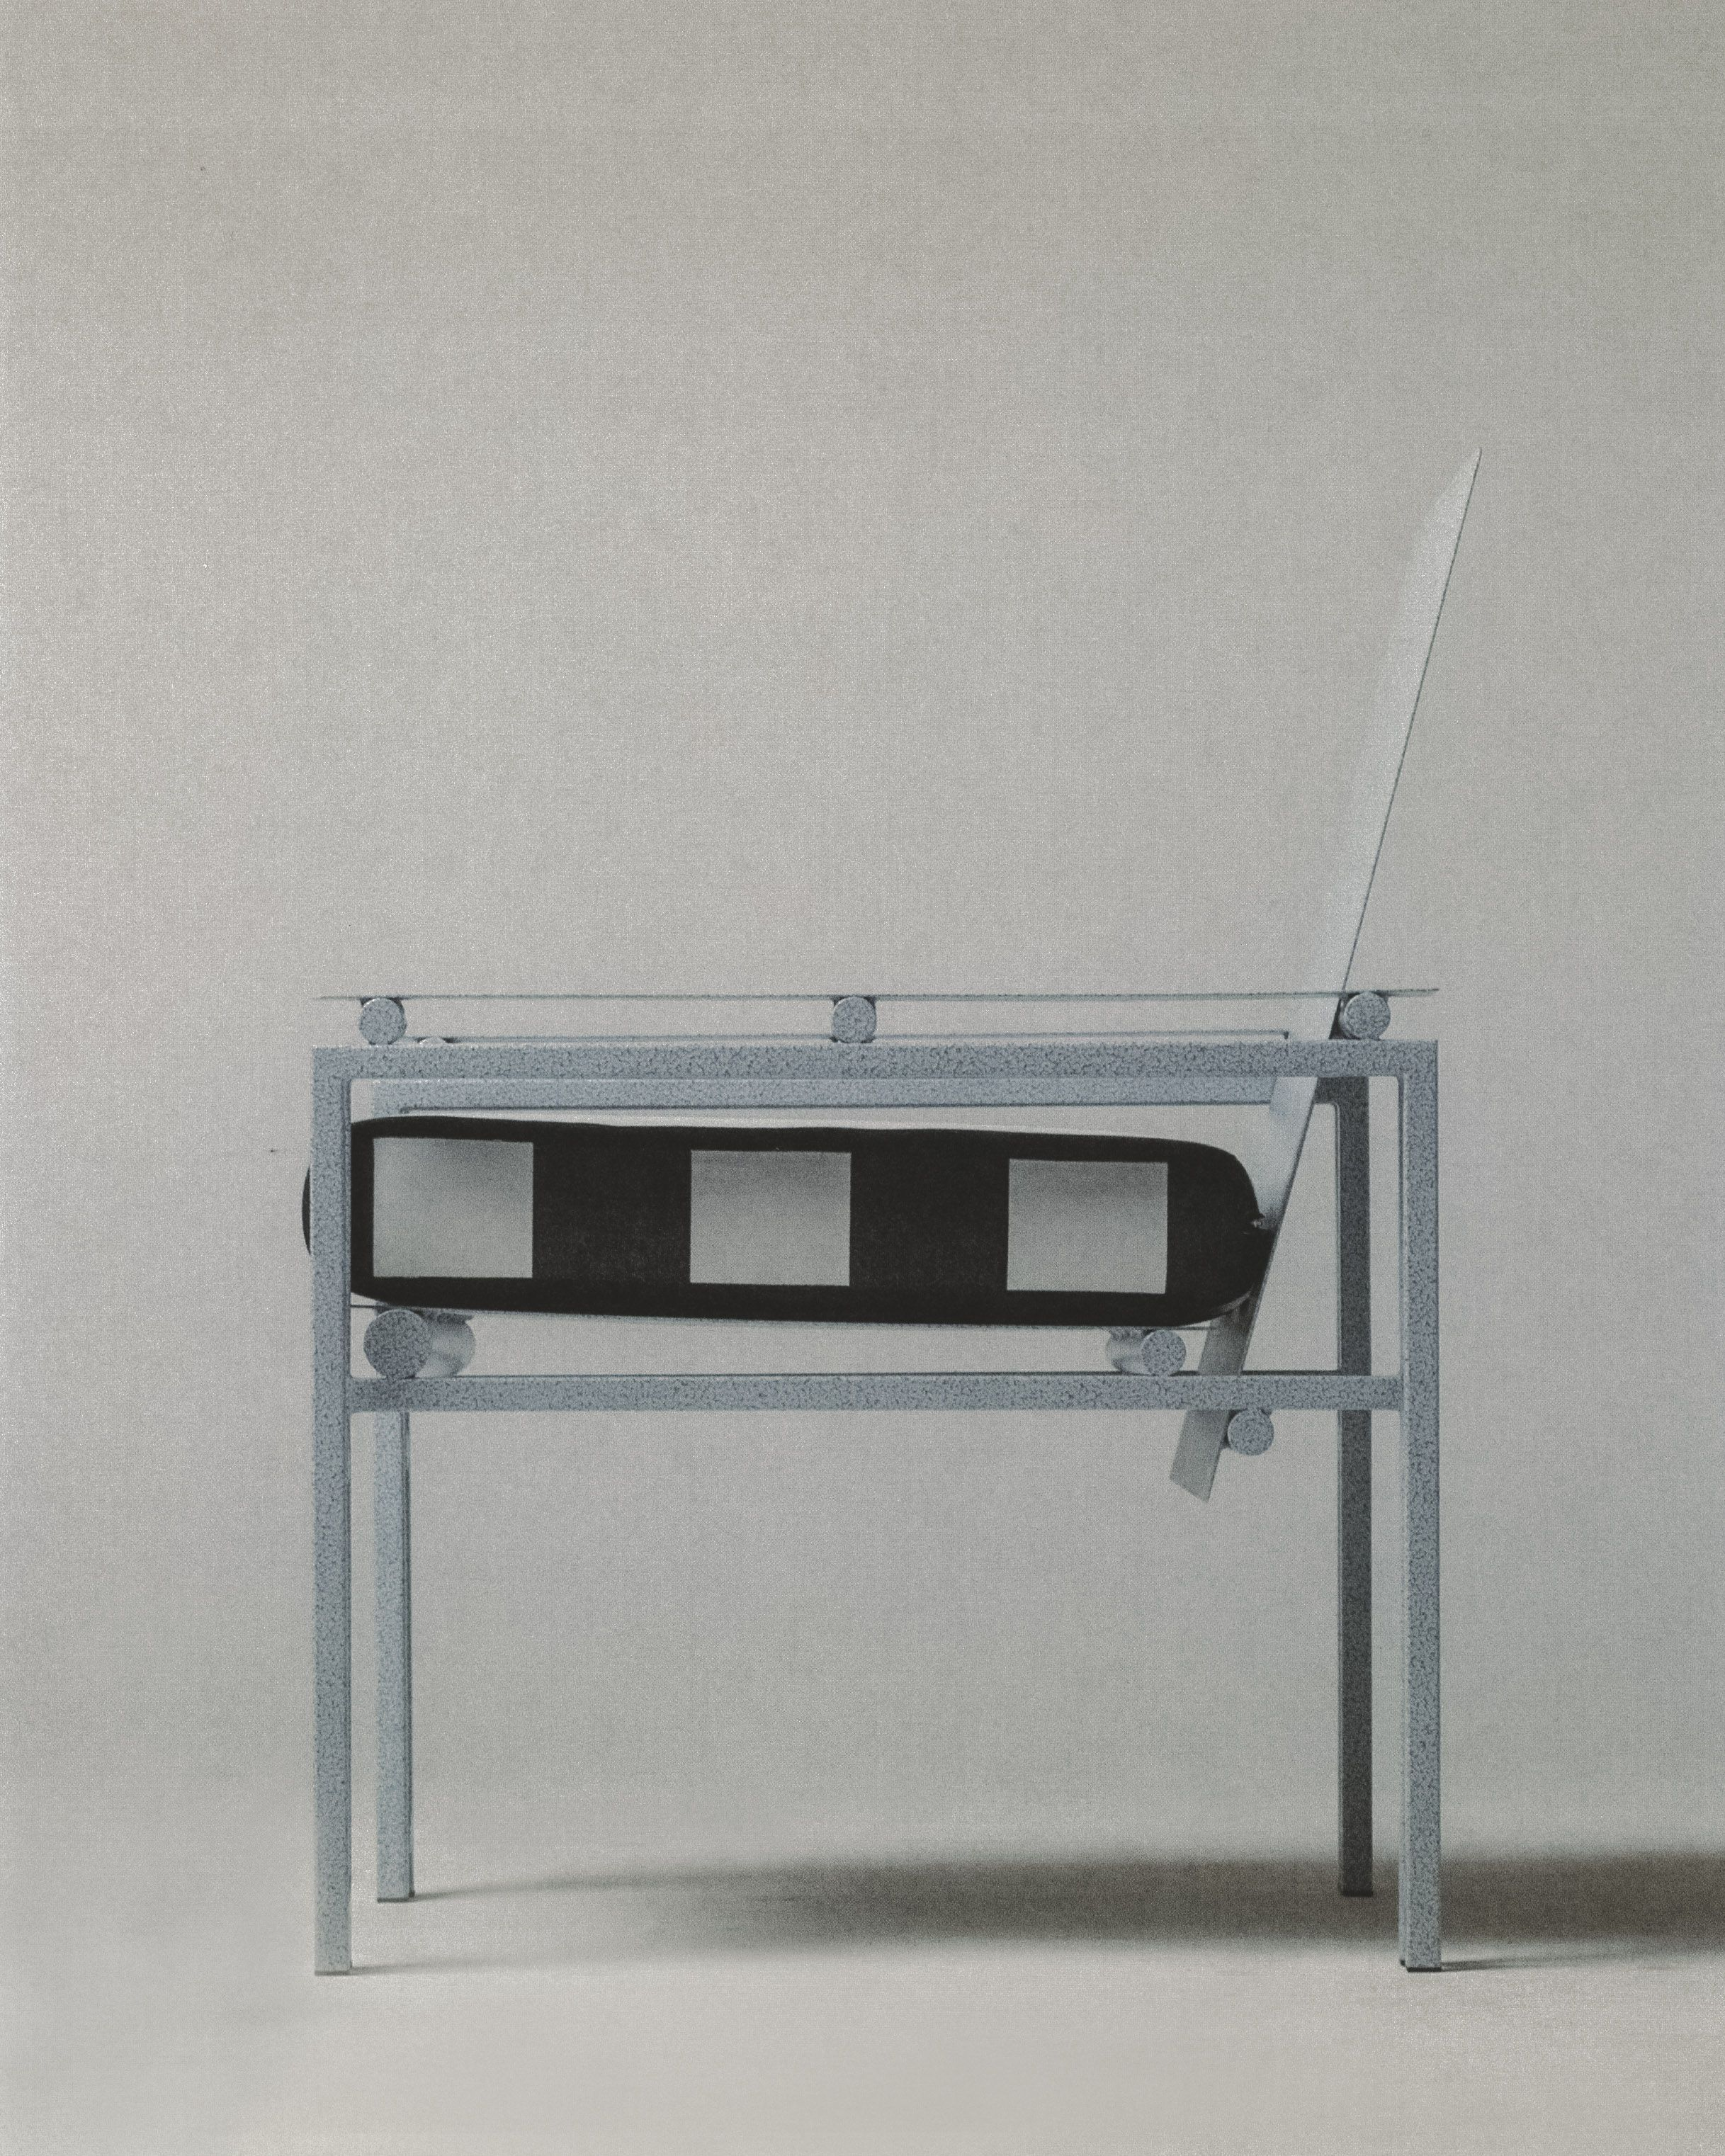 Suspension Metal Lounge product image 4